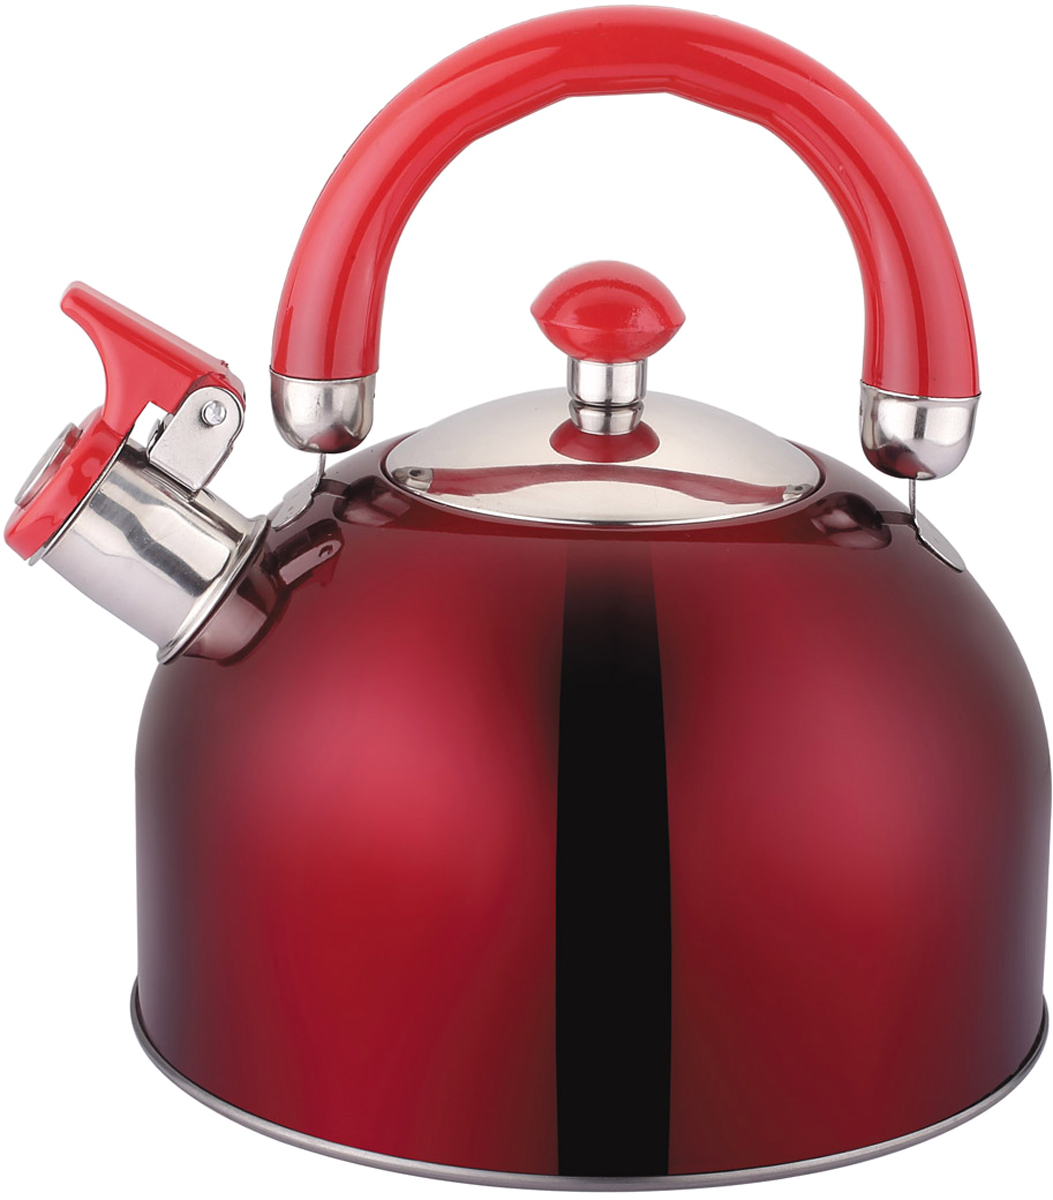 Чайник Appetite, со свистком, цвет: красный, 2,5 л. LKD-2025B чайник lumme со свистком цвет золотистый 1 8 л